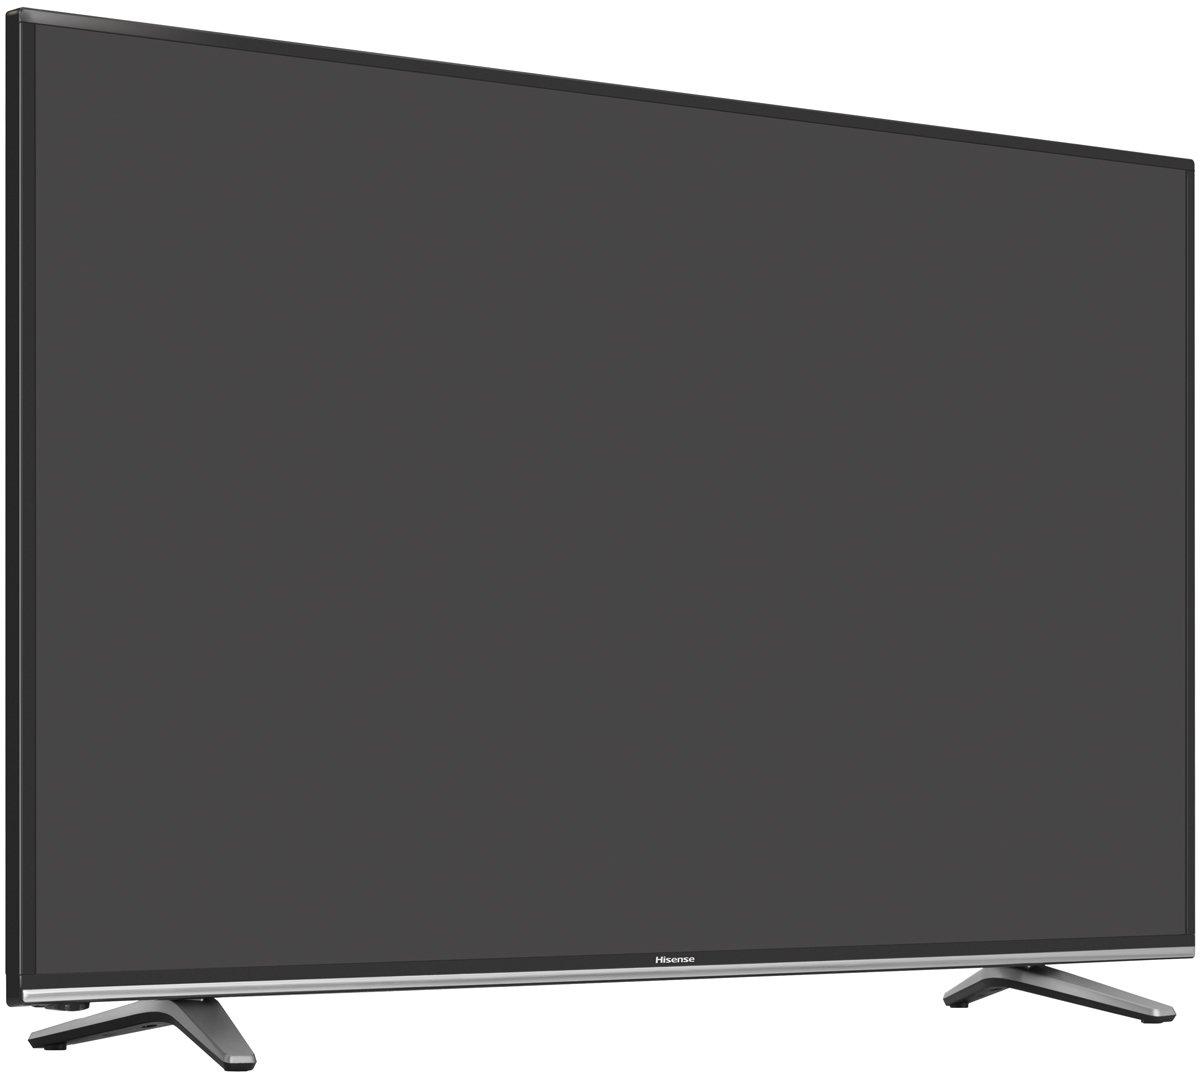 hisense 50k3300uw 50 inch 127cm smart 4k ultra hd led lcd tv - 50in Tv